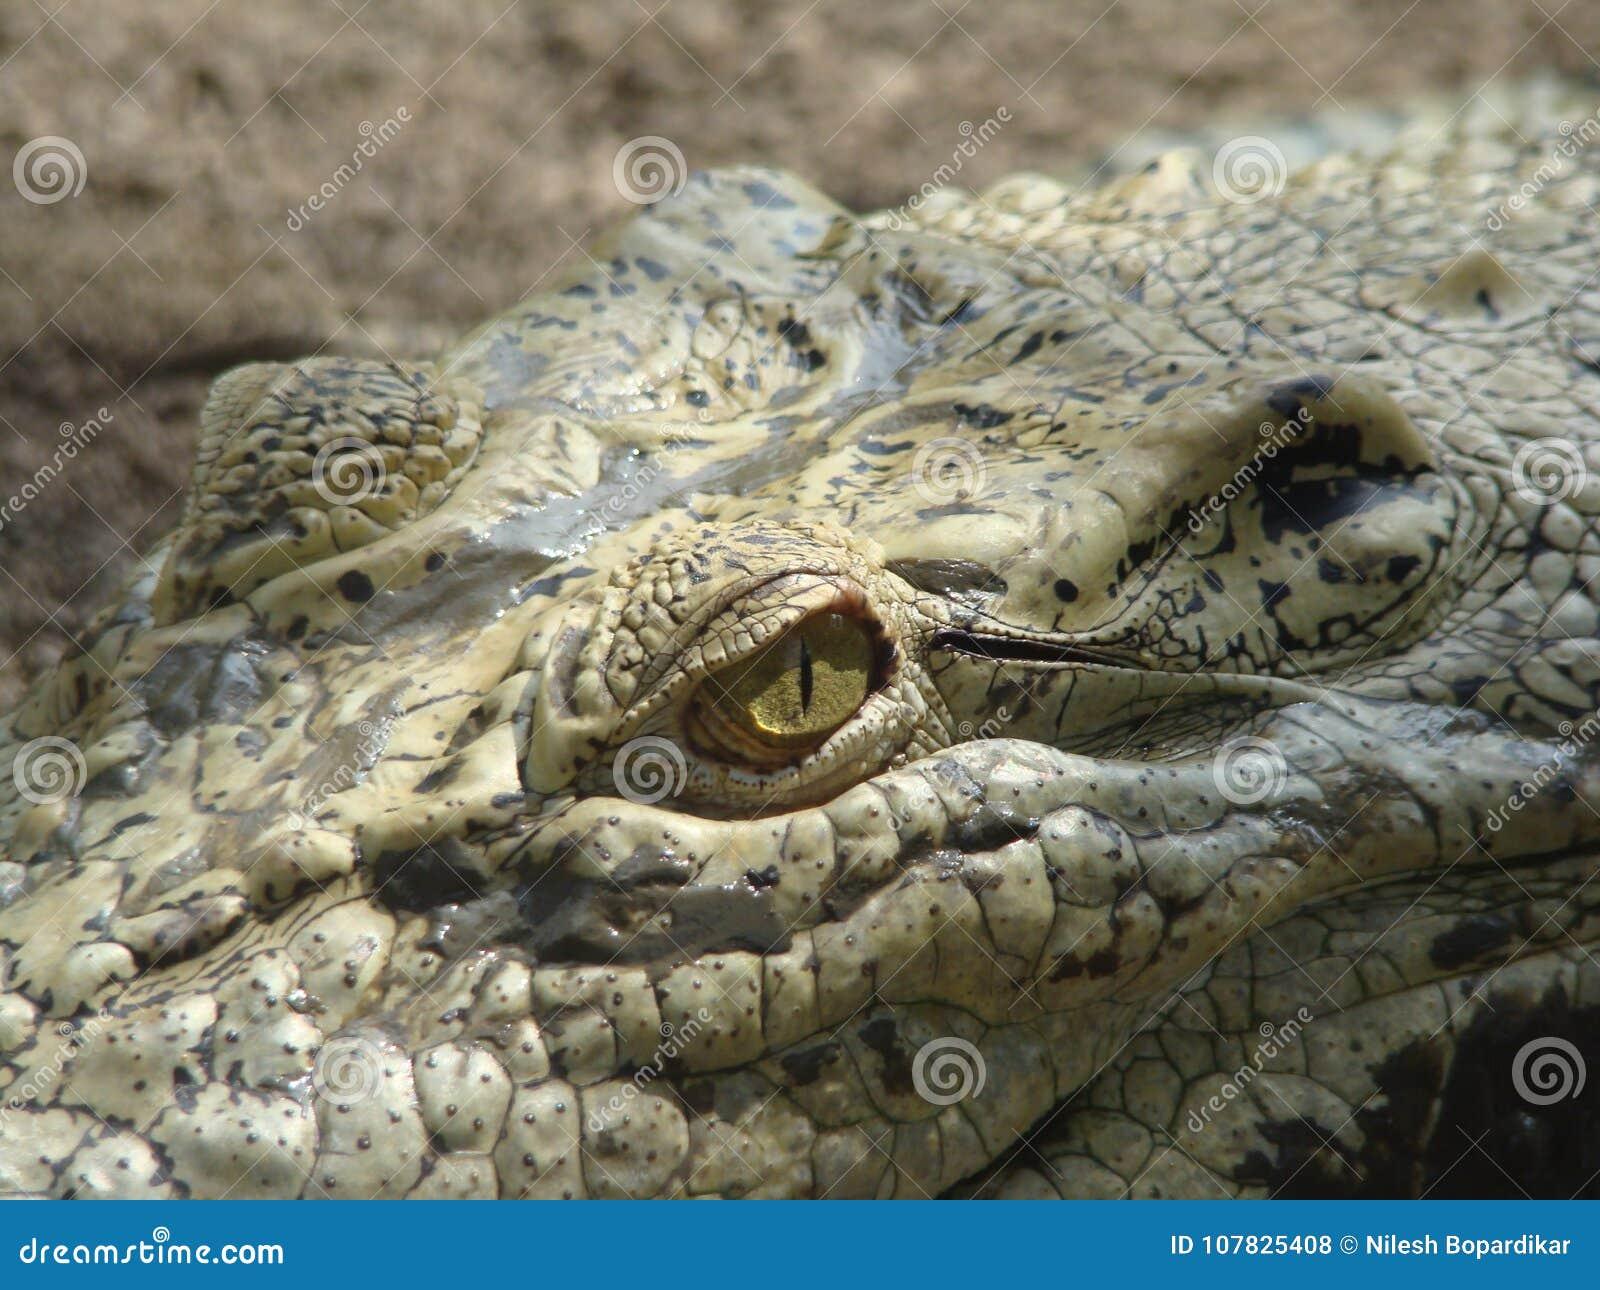 Crocodile Saying dare if you come here